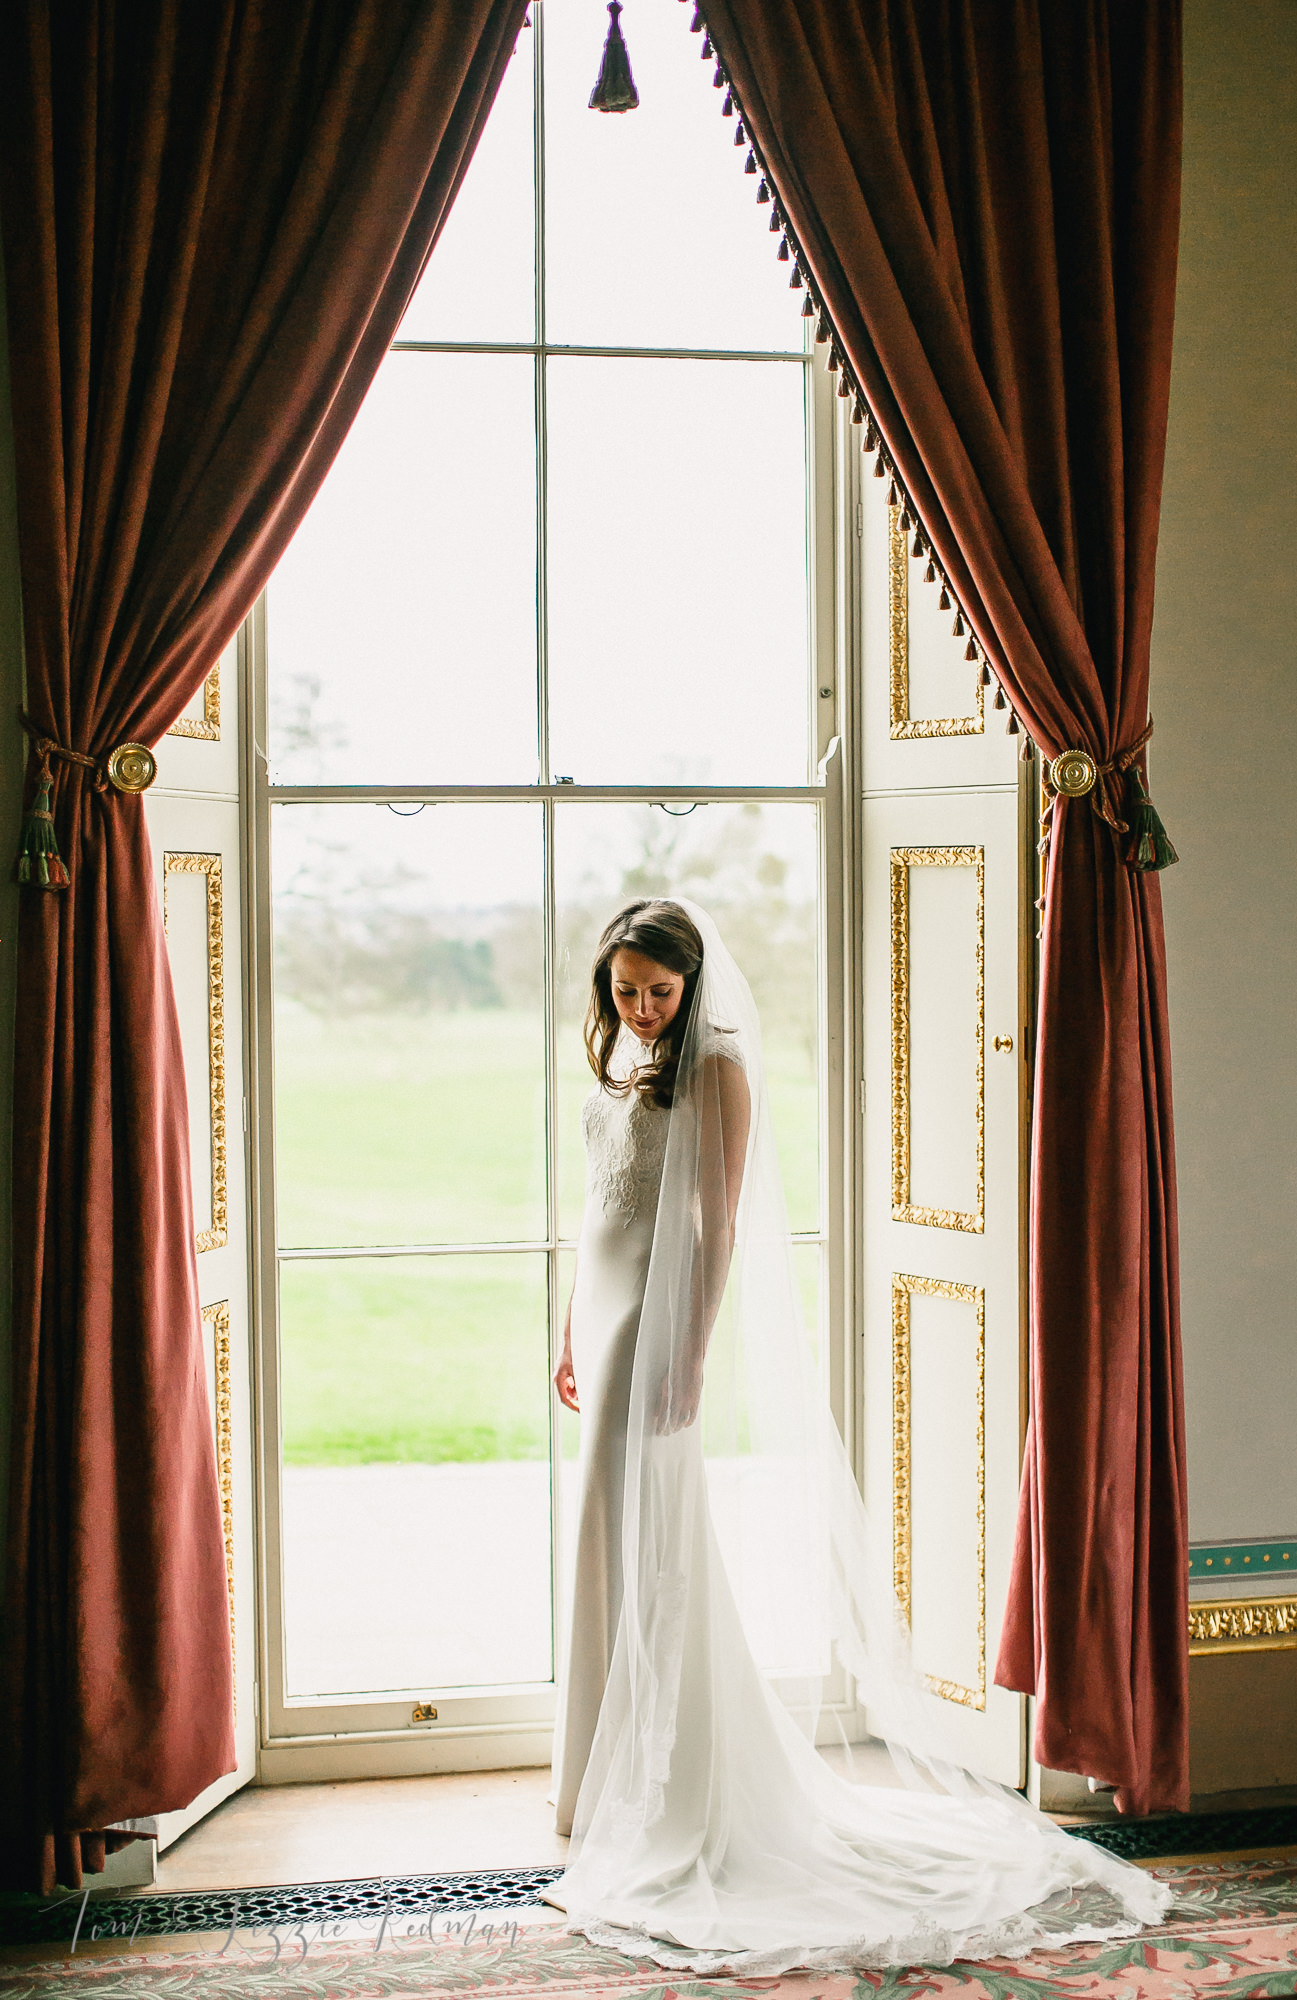 Dorset wedding photographers 027.jpg